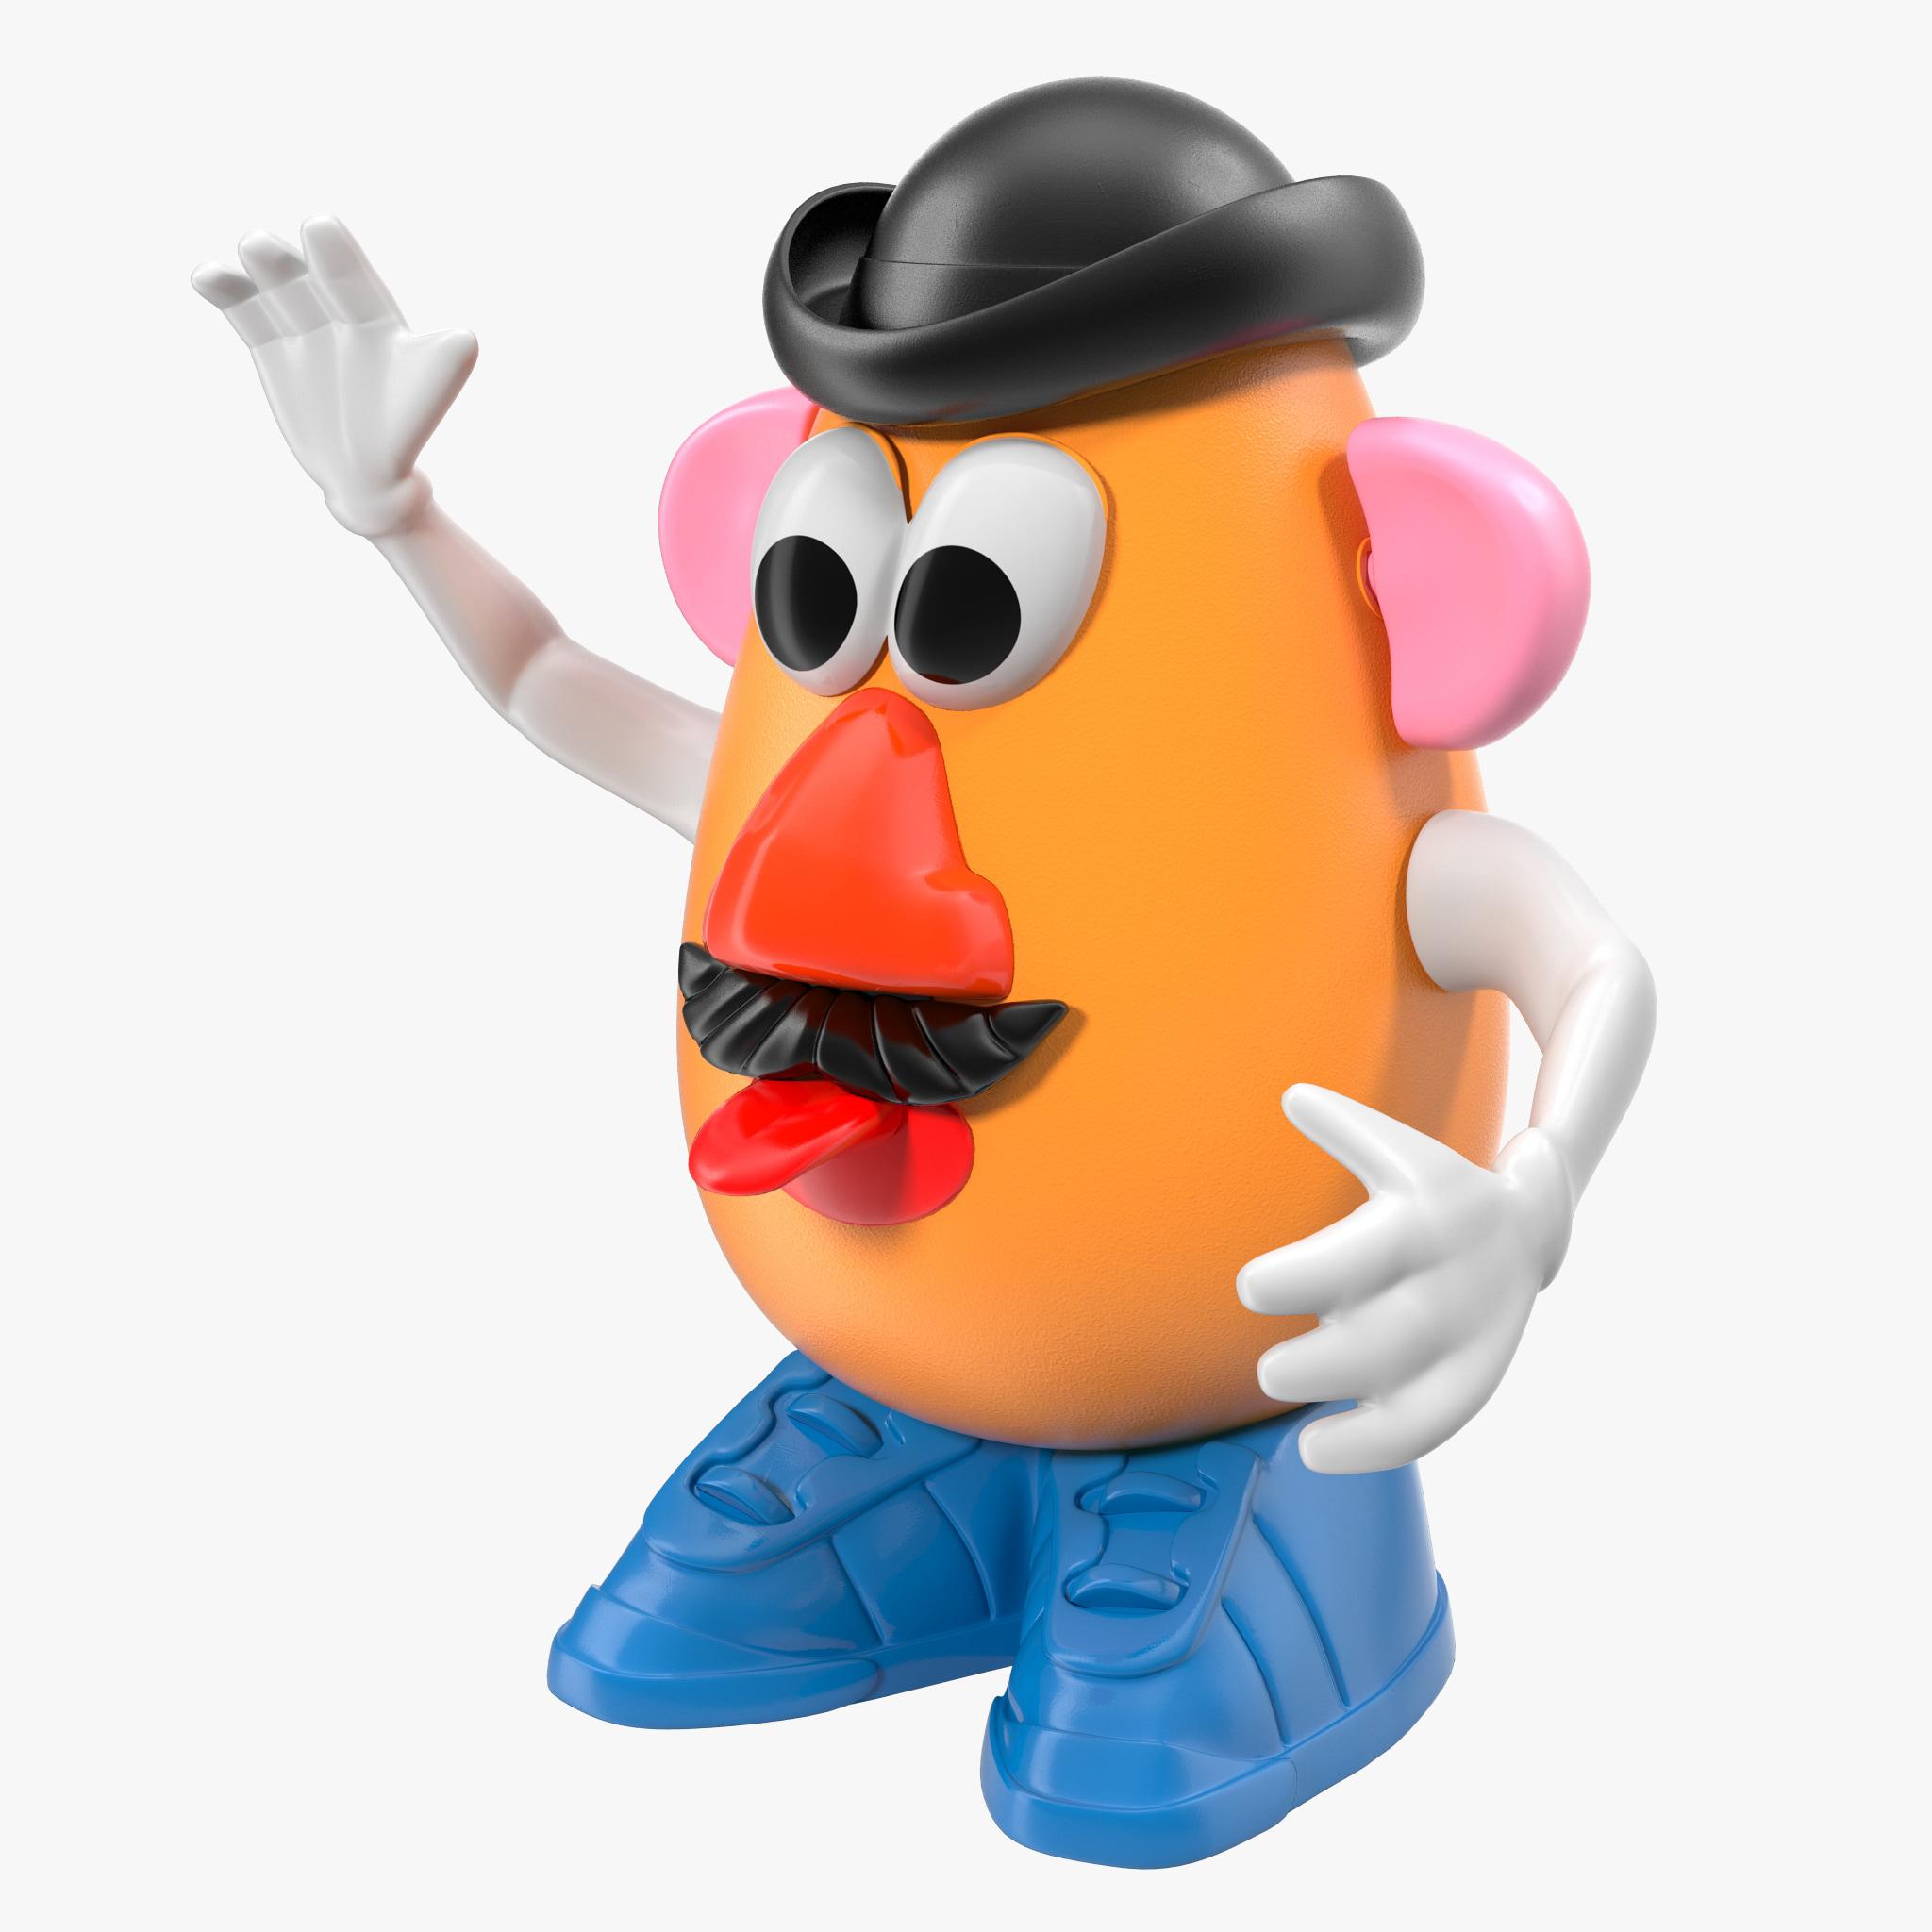 Mr. Potato Head 3